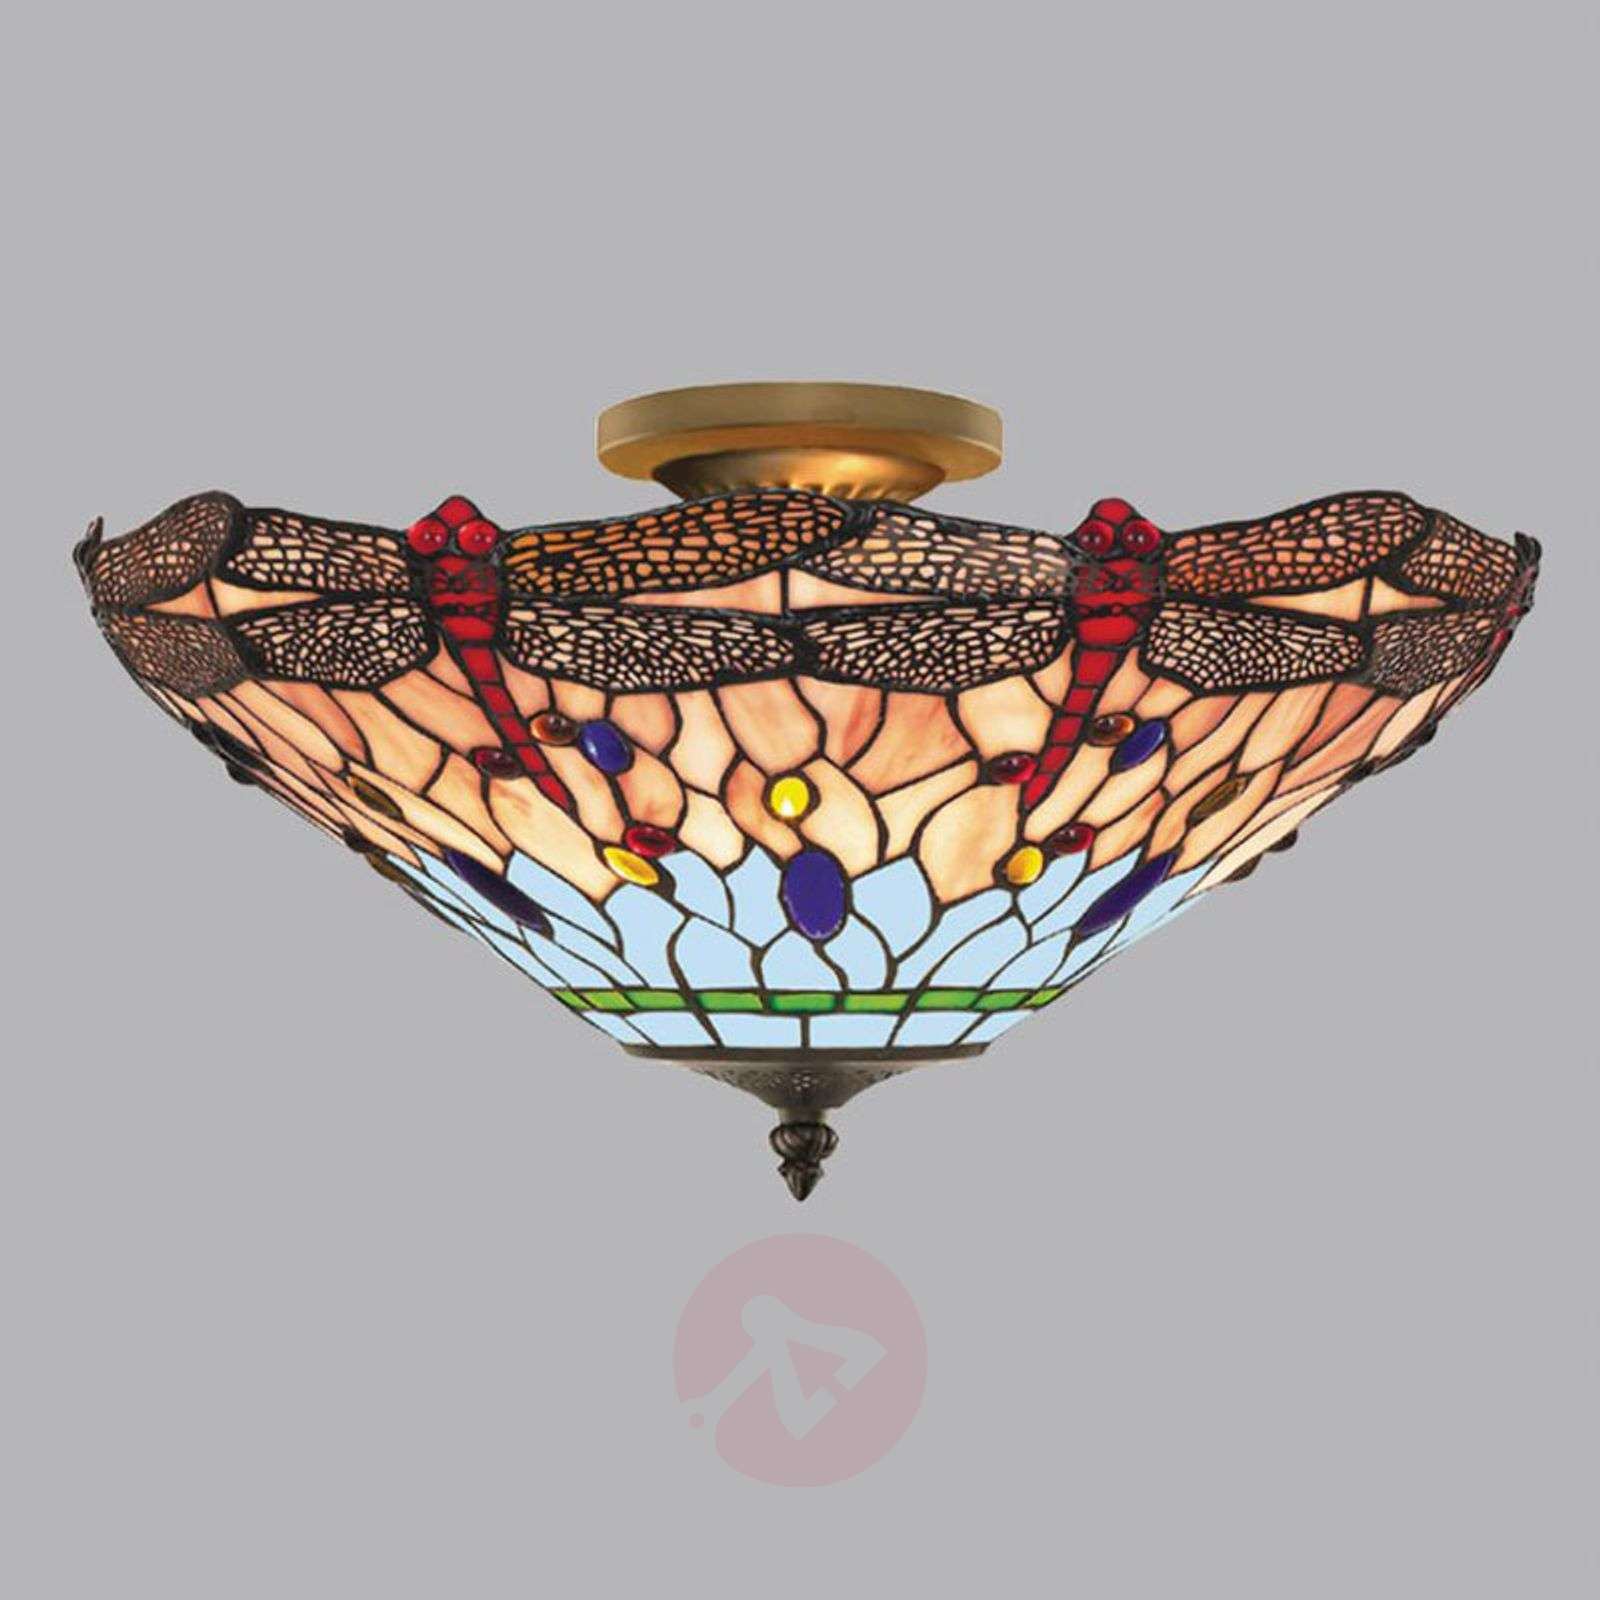 DRAGONFLY Tiffany-tyylinen kattovalaisin-8570405-03